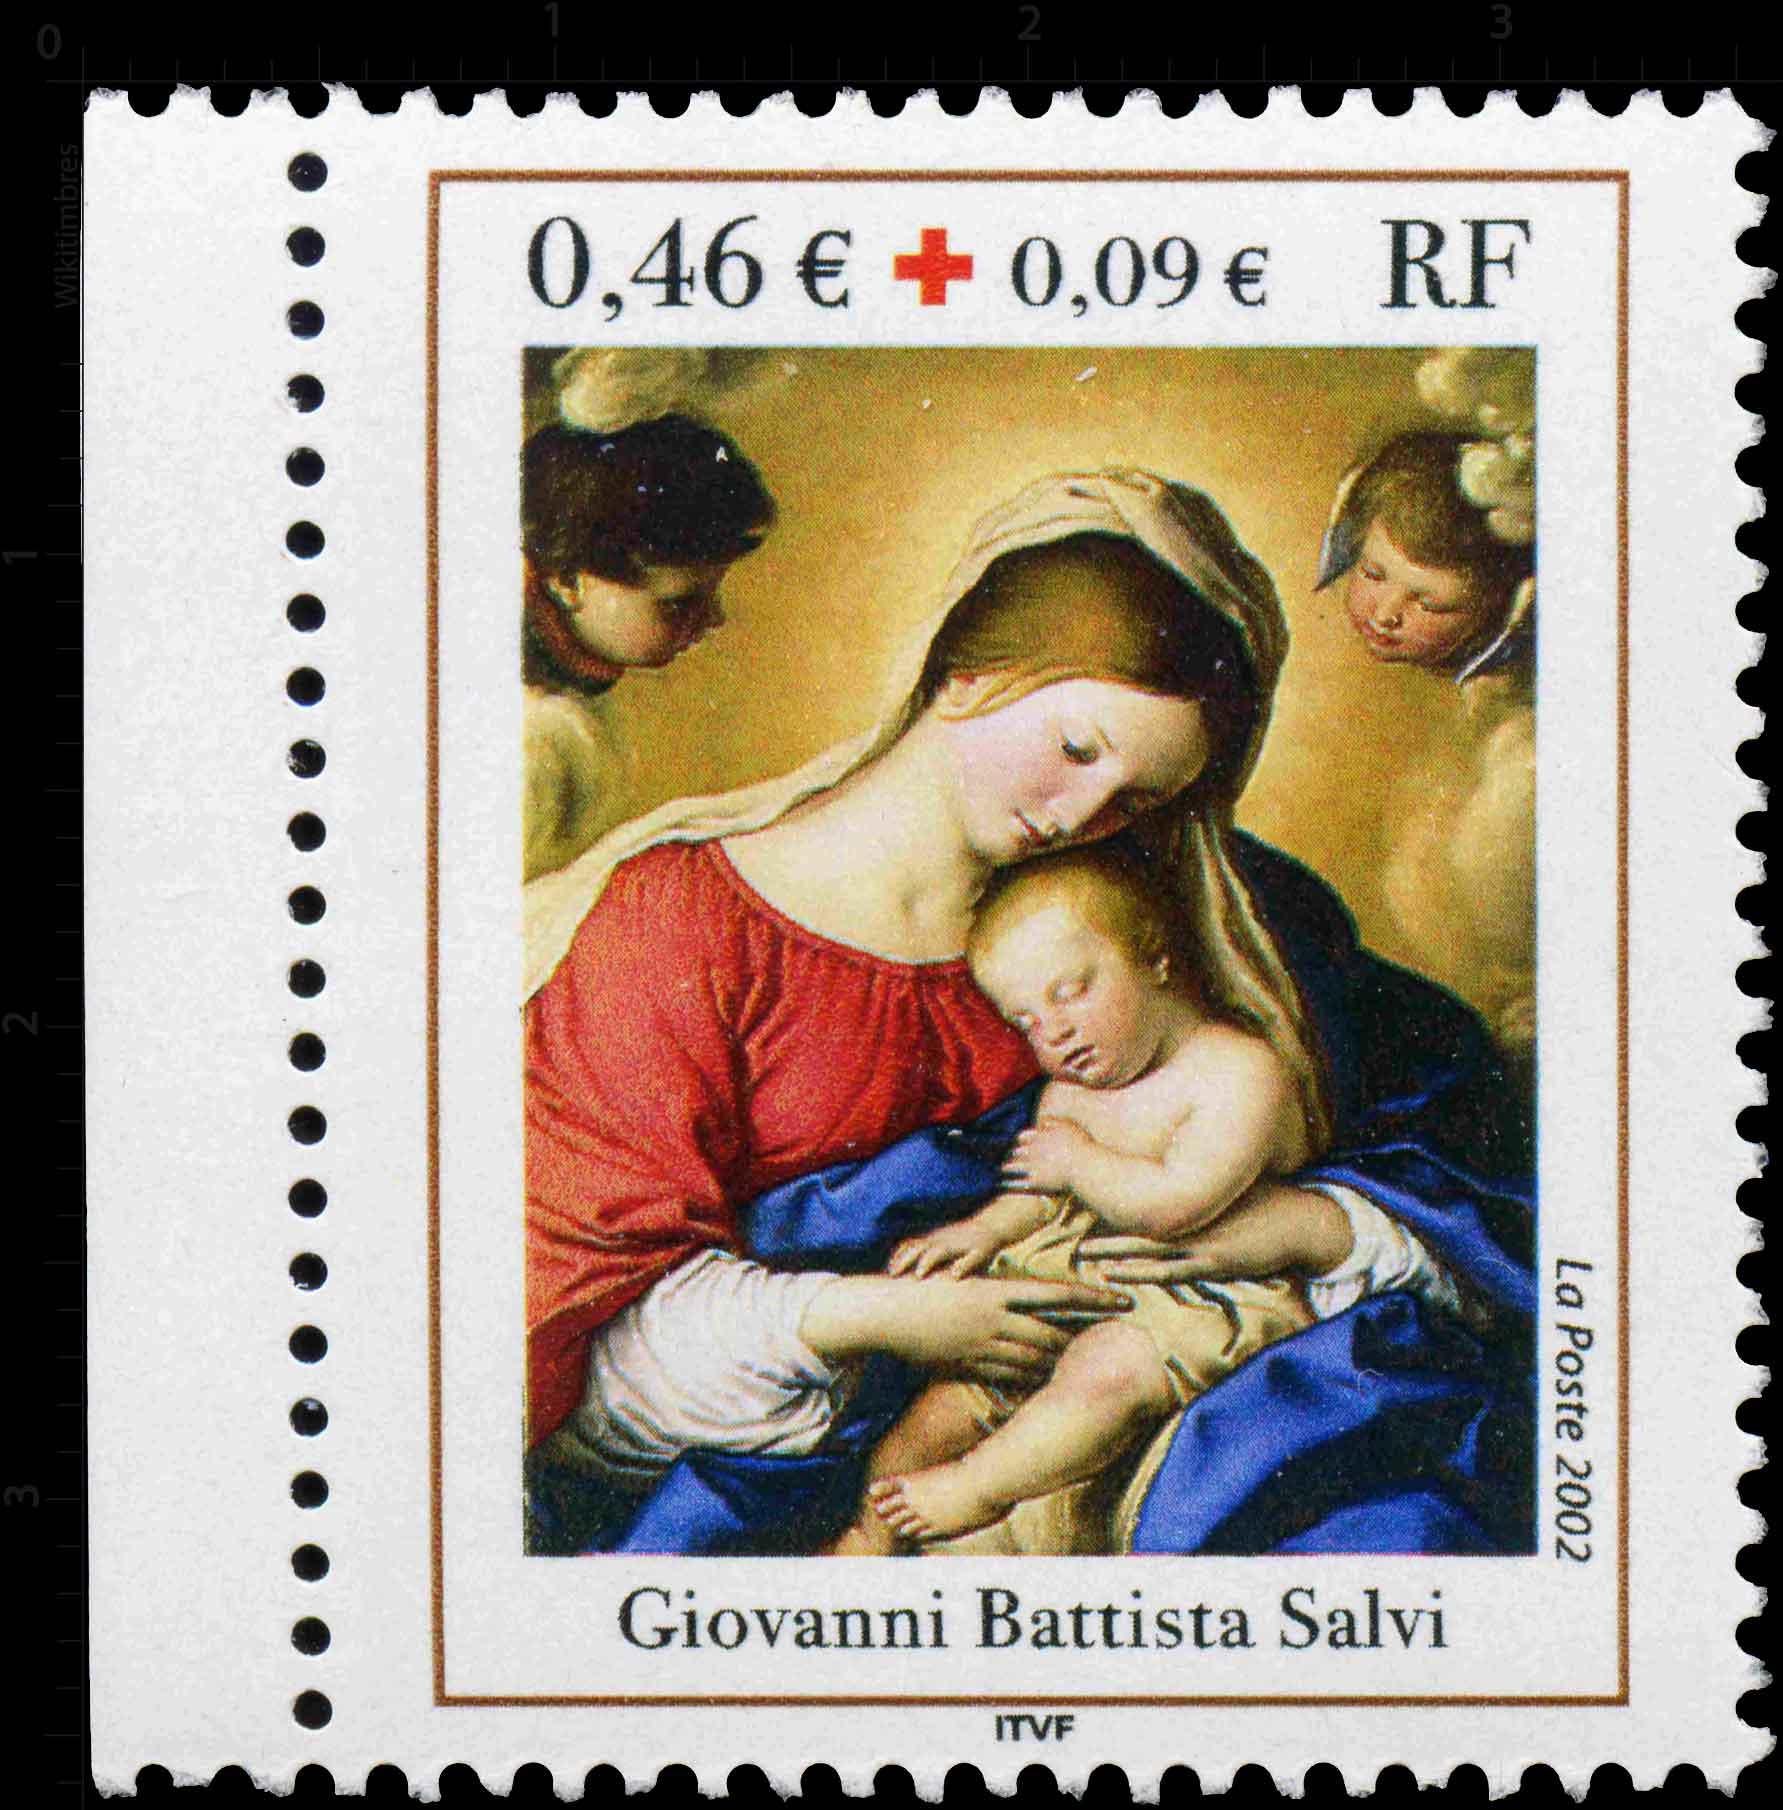 2002 Giovanni Battista Salvi